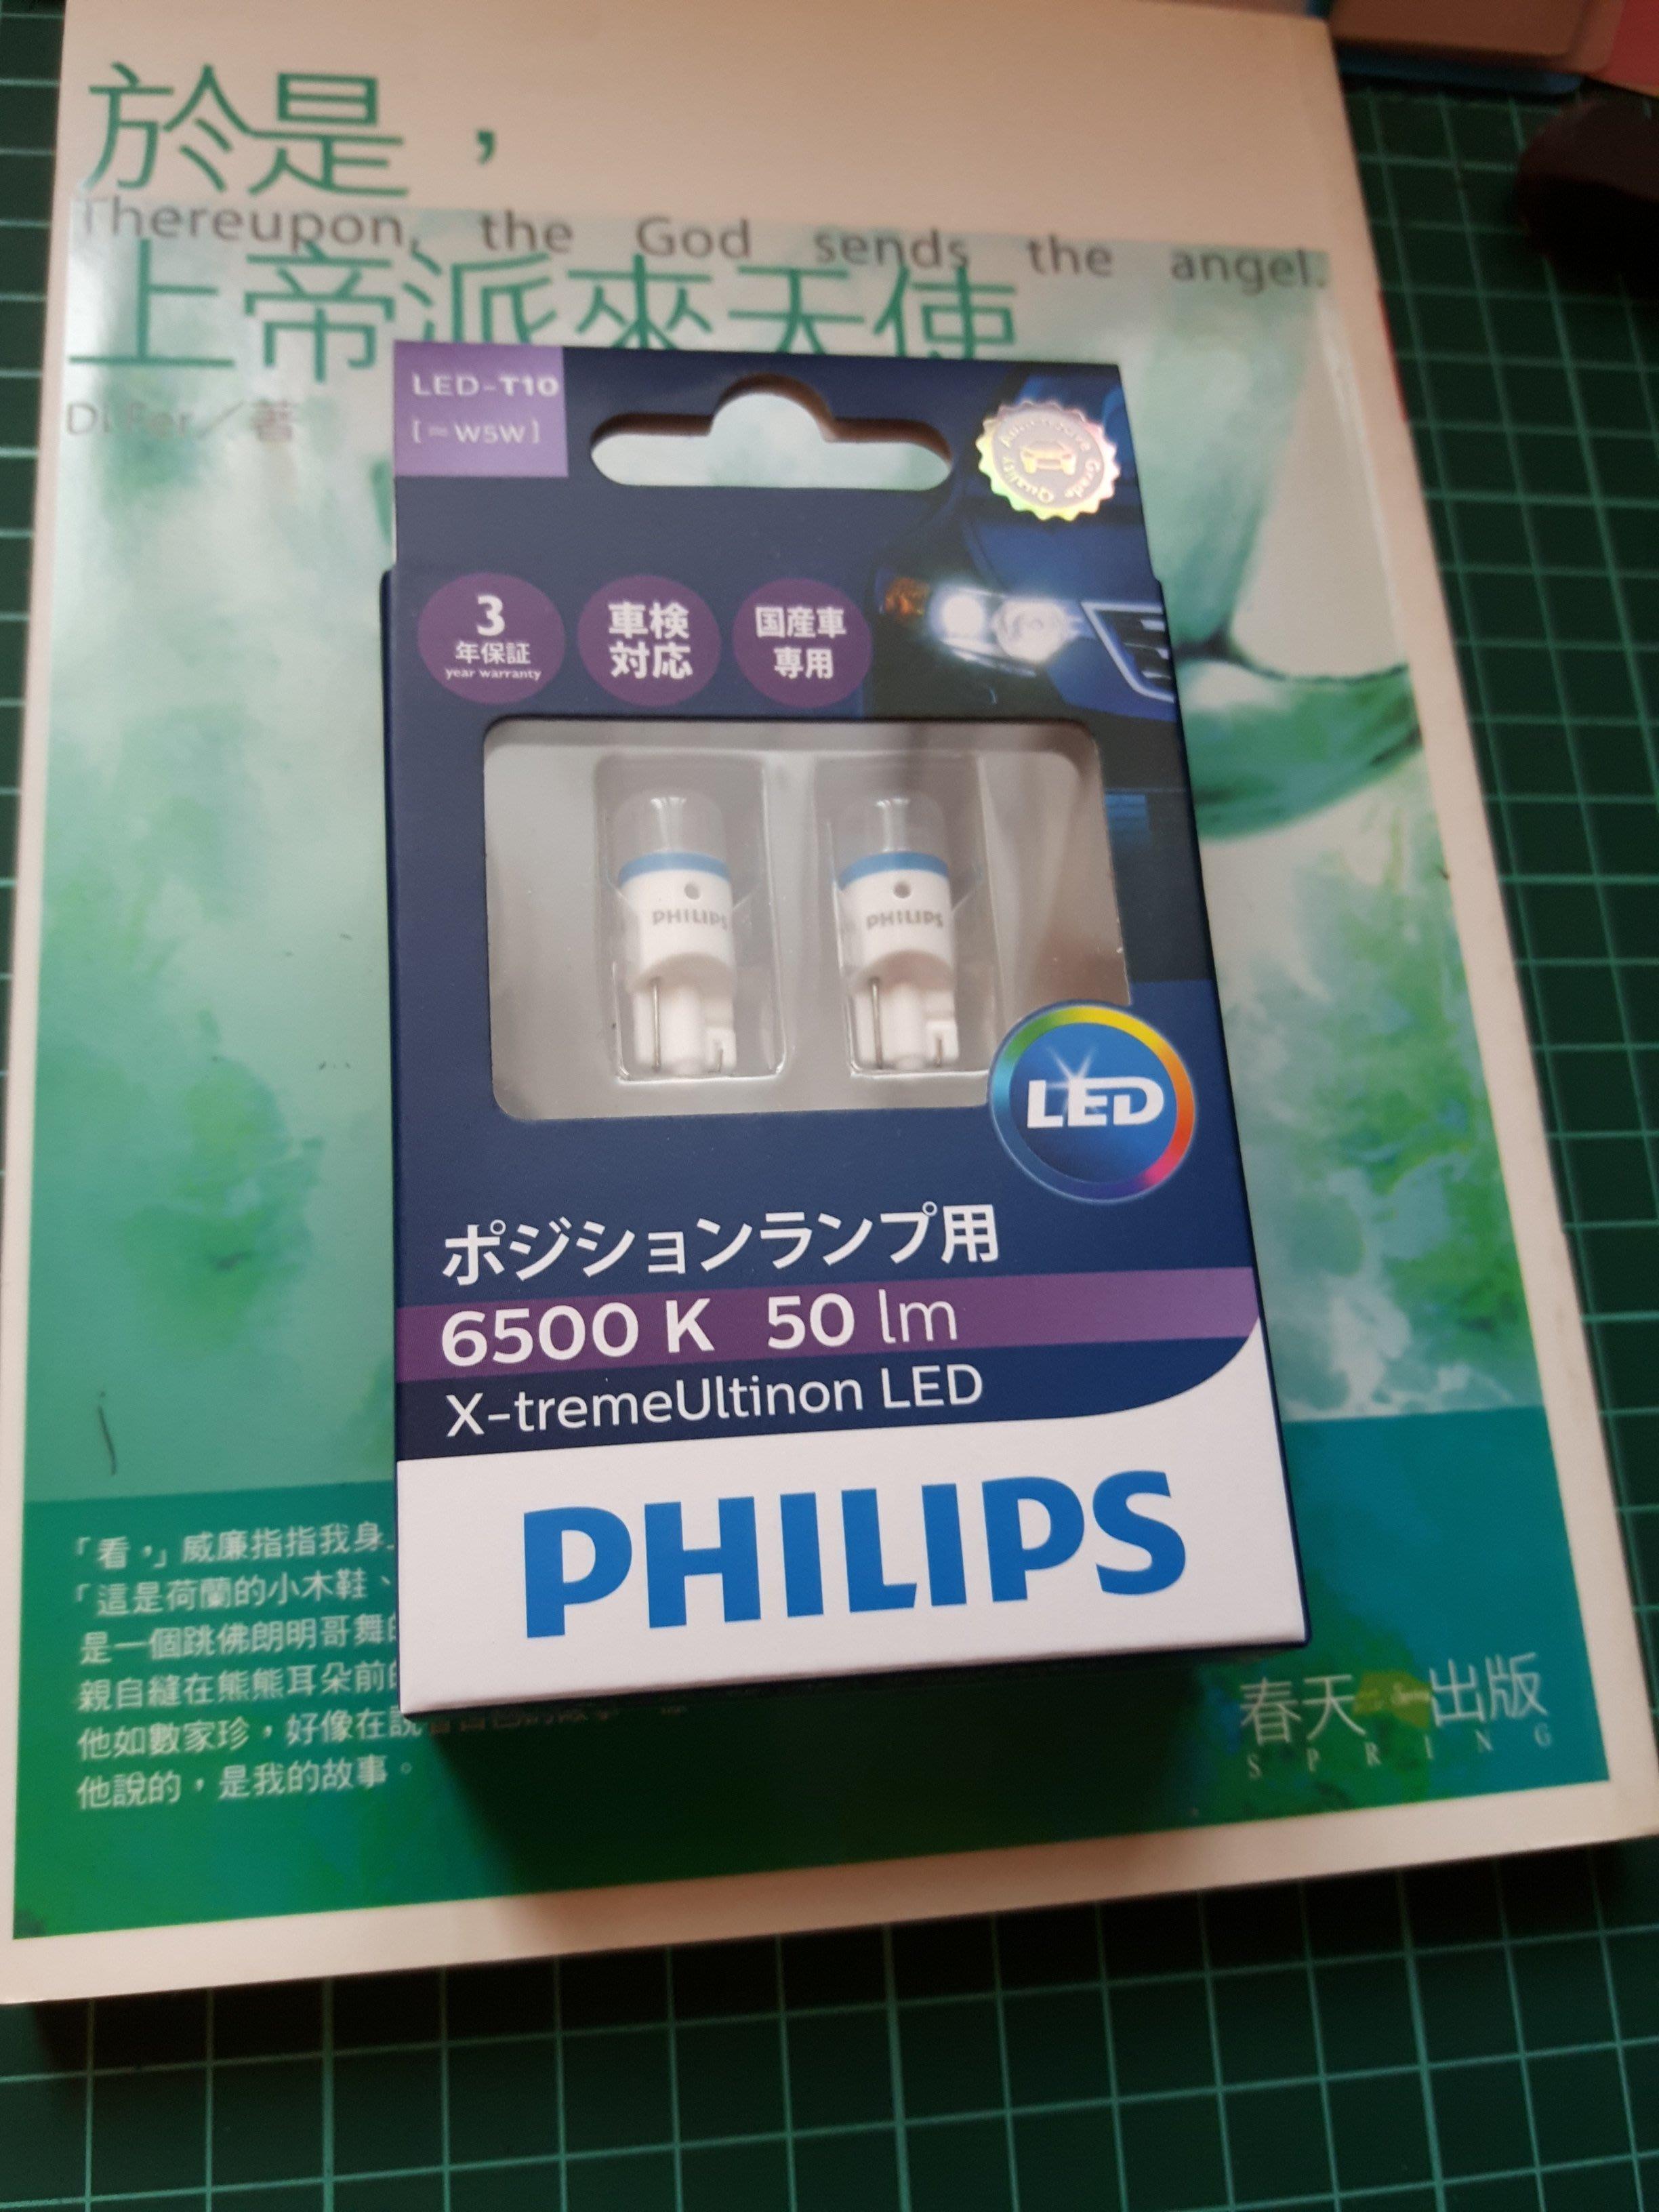 6500K !  Led w5w t10 Philips New  冷極光白 定位燈 牌照燈 前小燈 Osram